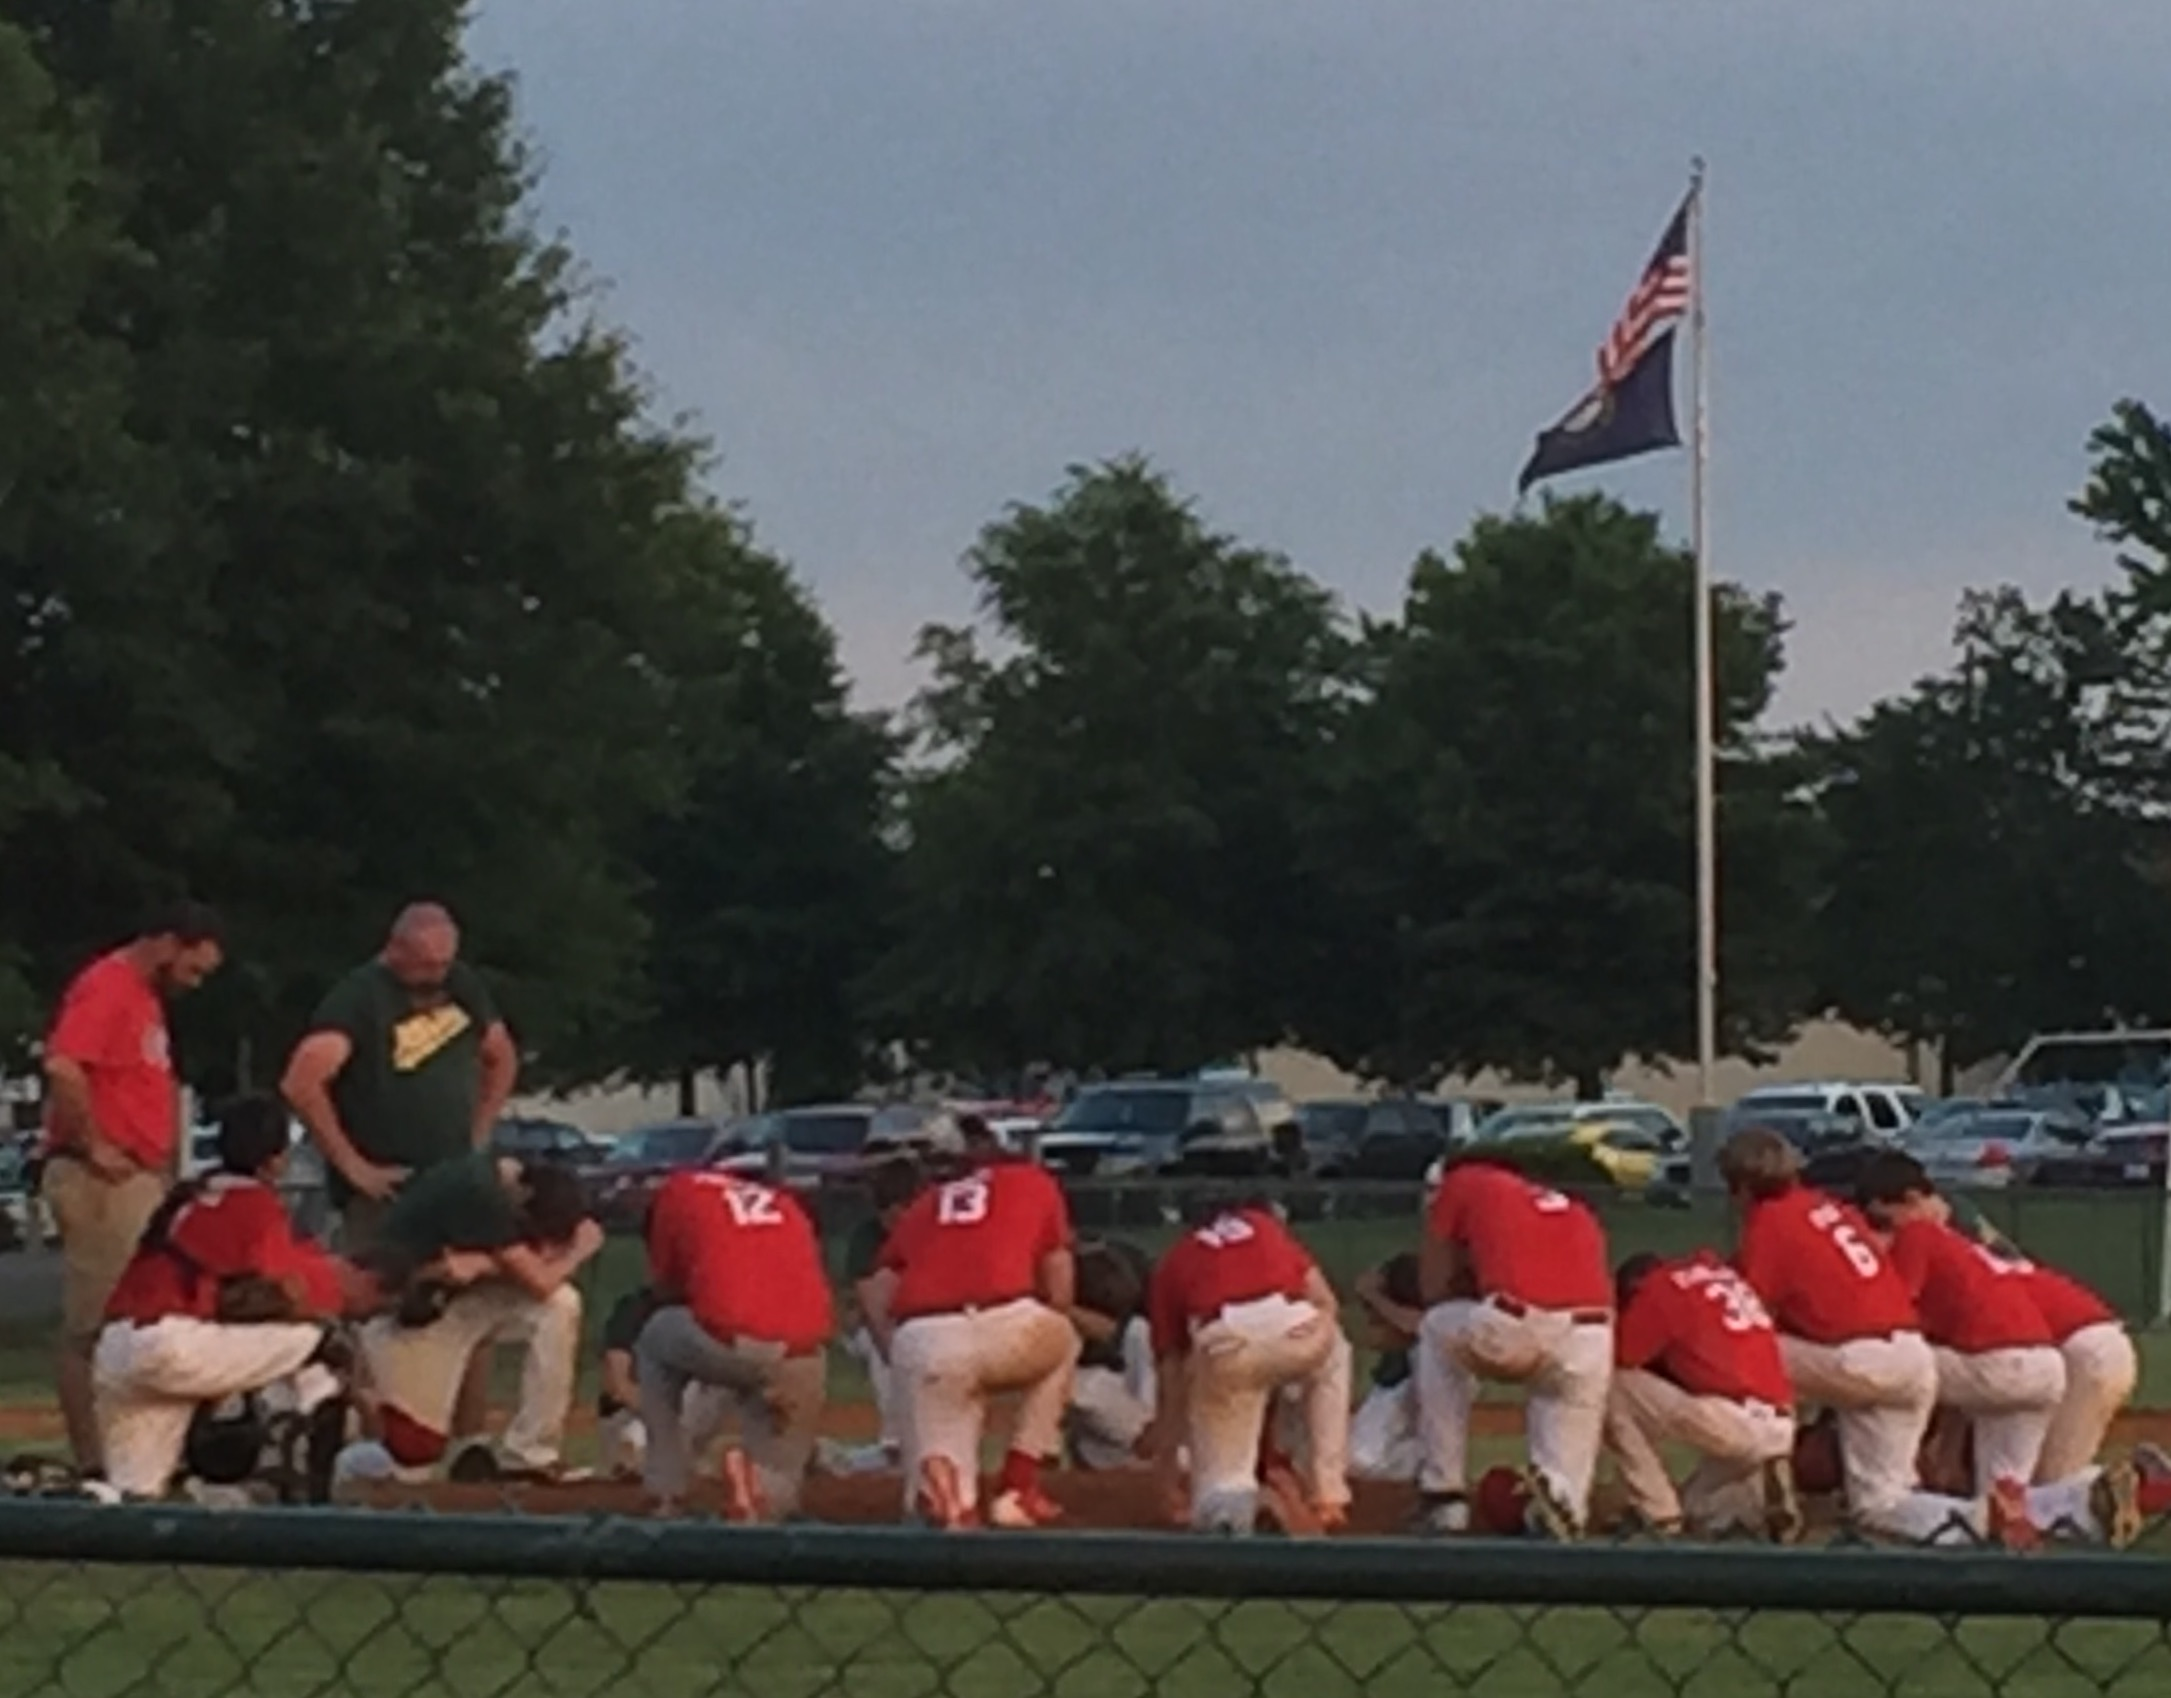 Murray Youth Baseball & Softball Association, Youth Baseball & Softball, Run, Field